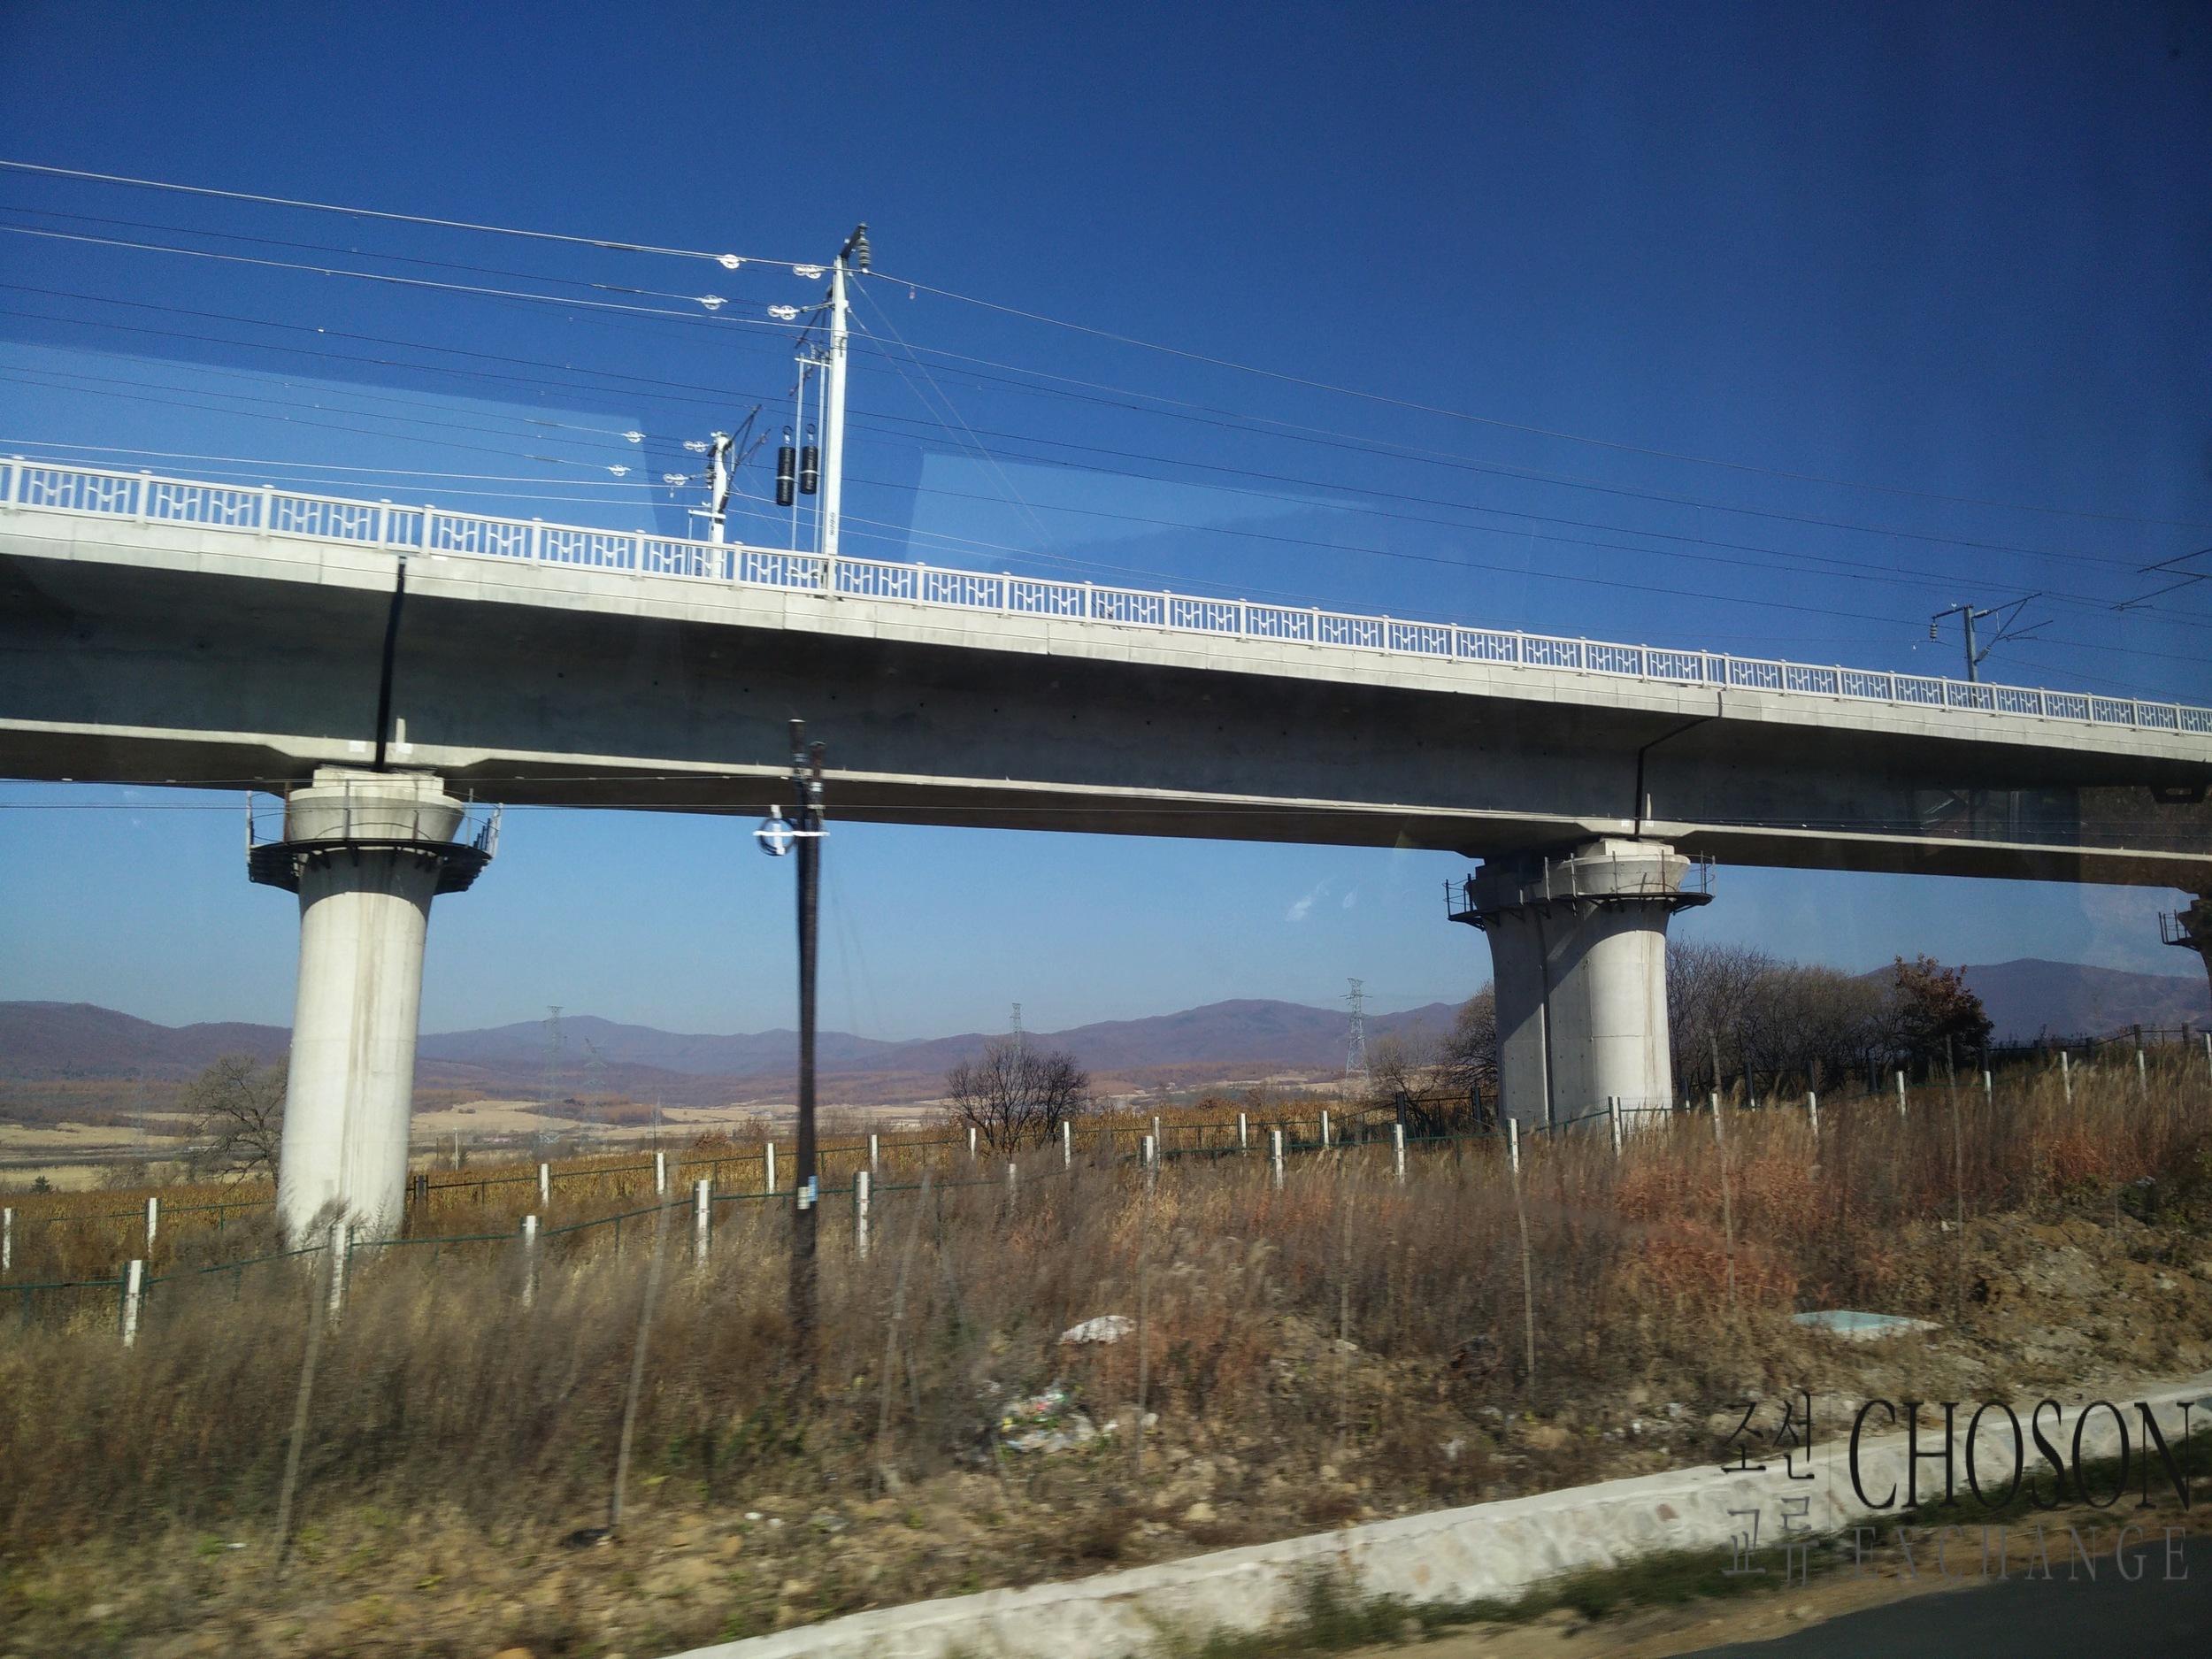 Look left, high speed rail